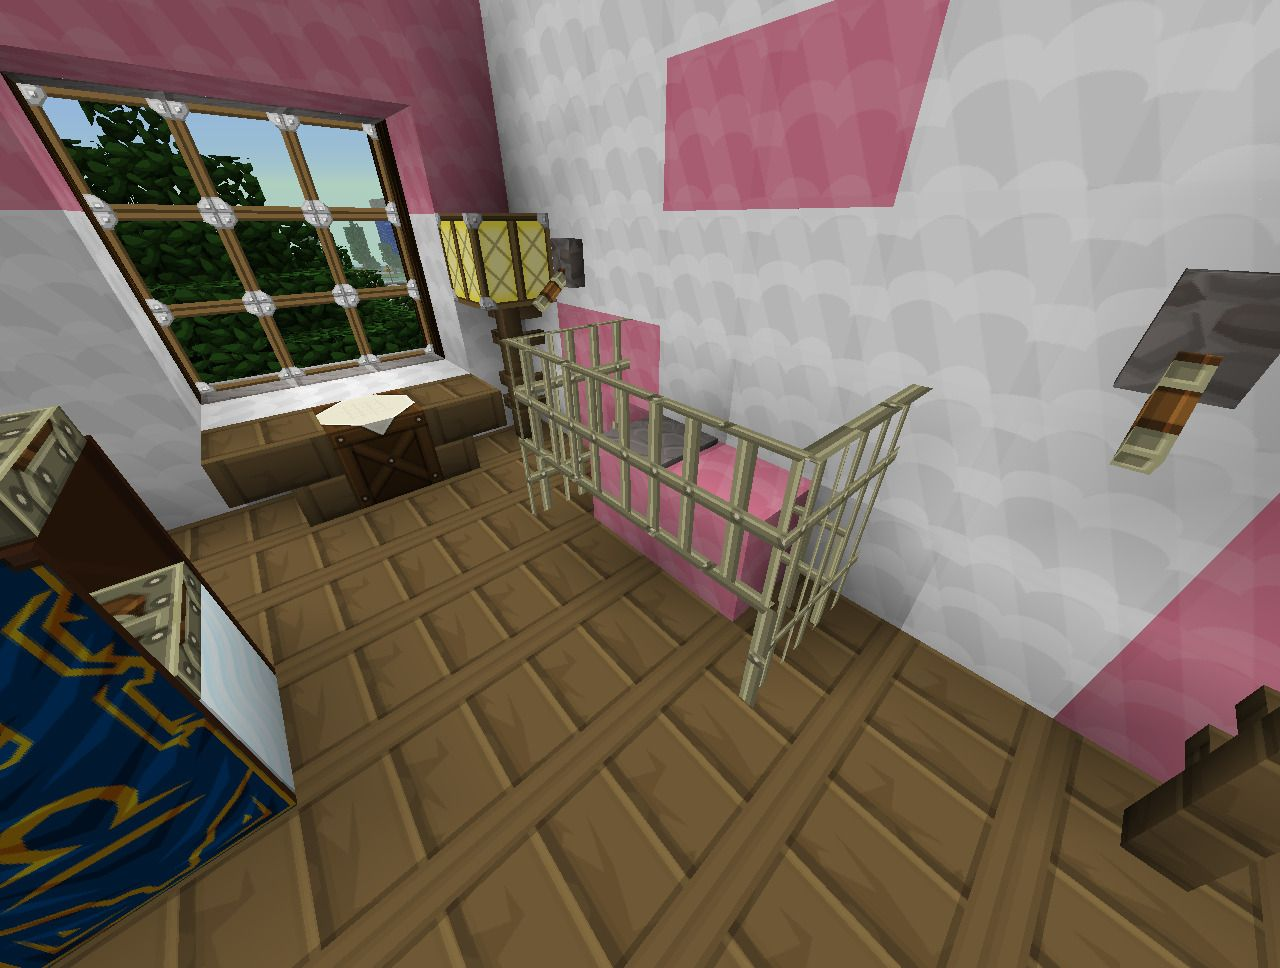 Cool Bedroom Ideas On Minecraft | Minecraft bedroom decor ...